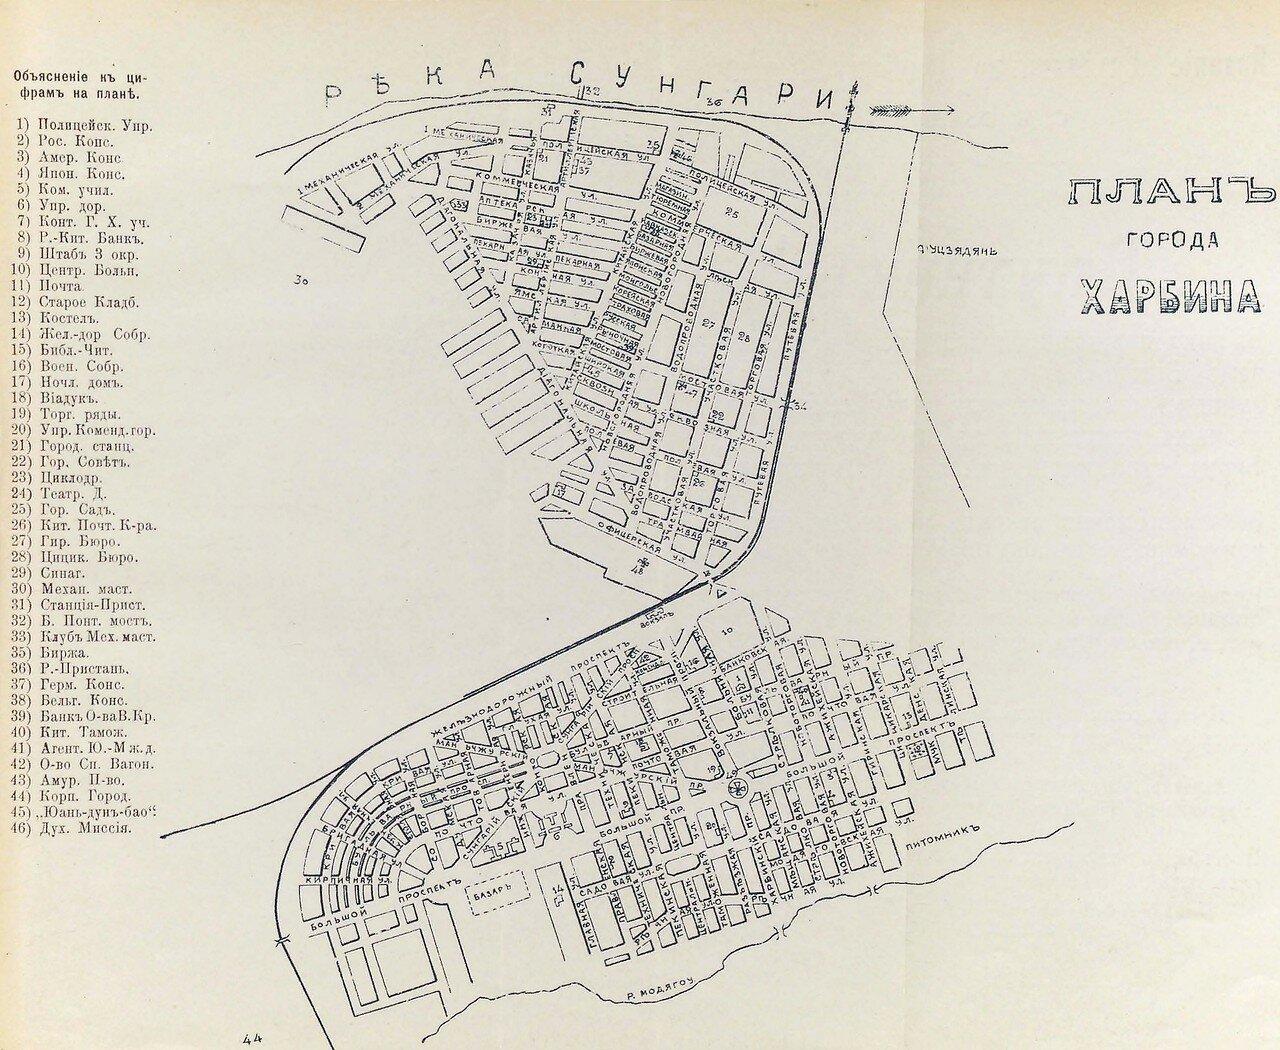 06. План города Харбина